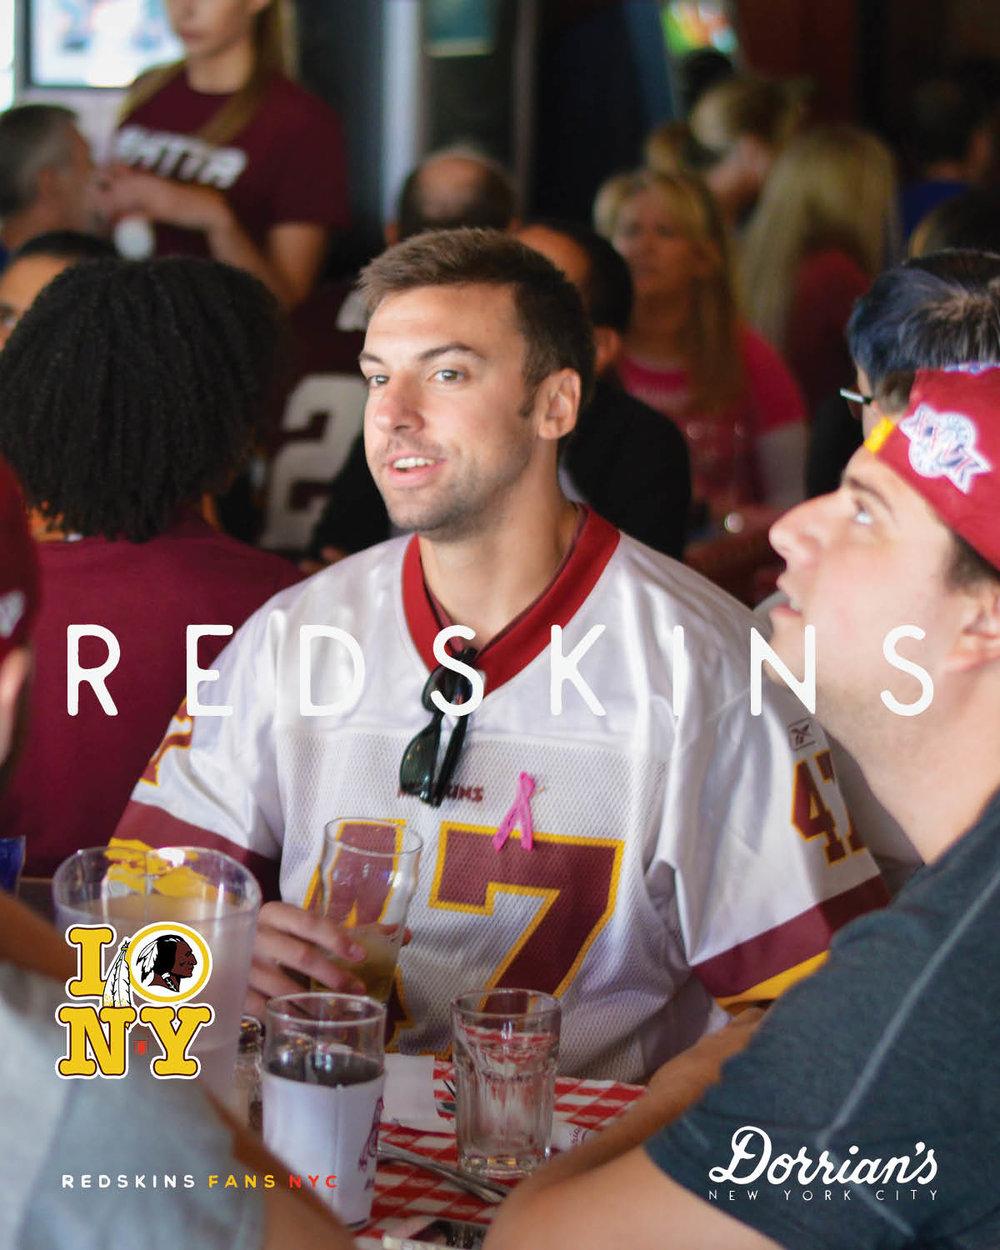 drh_nyc-2018-insta-redskins-bar-cheering-56.jpg